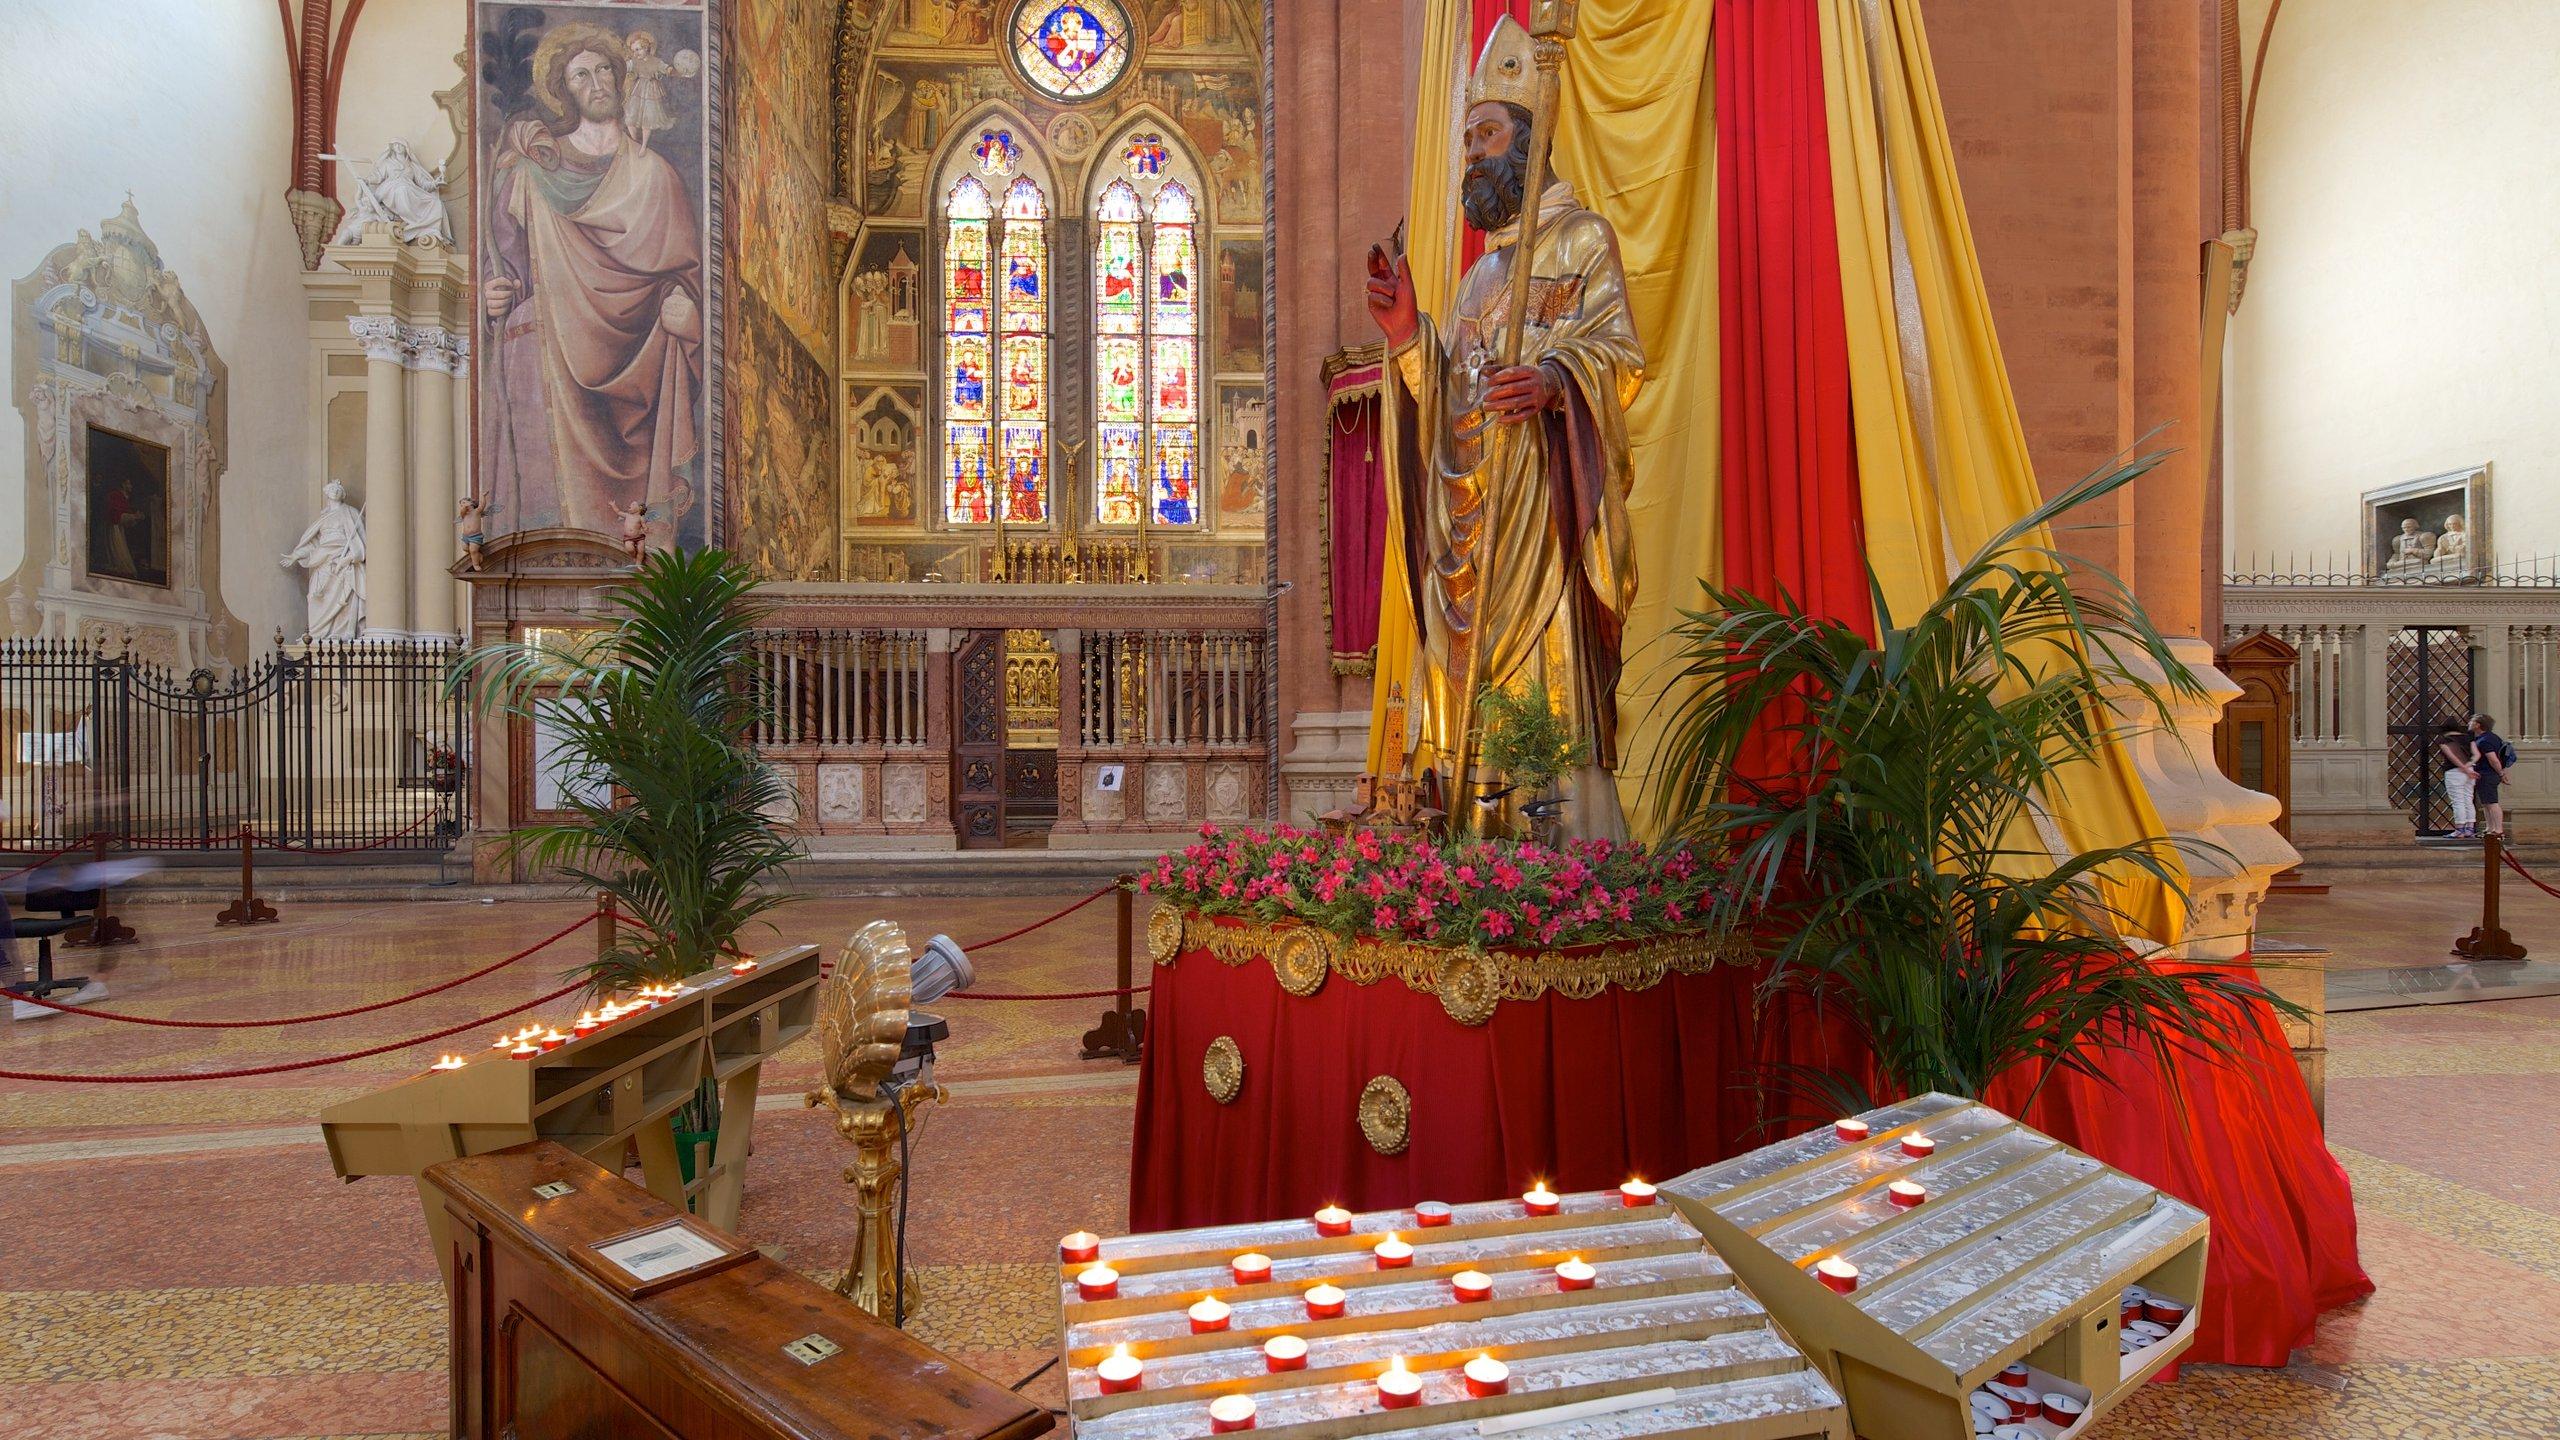 Santo Stefano, Bologna, Emilia-Romagna, Italy